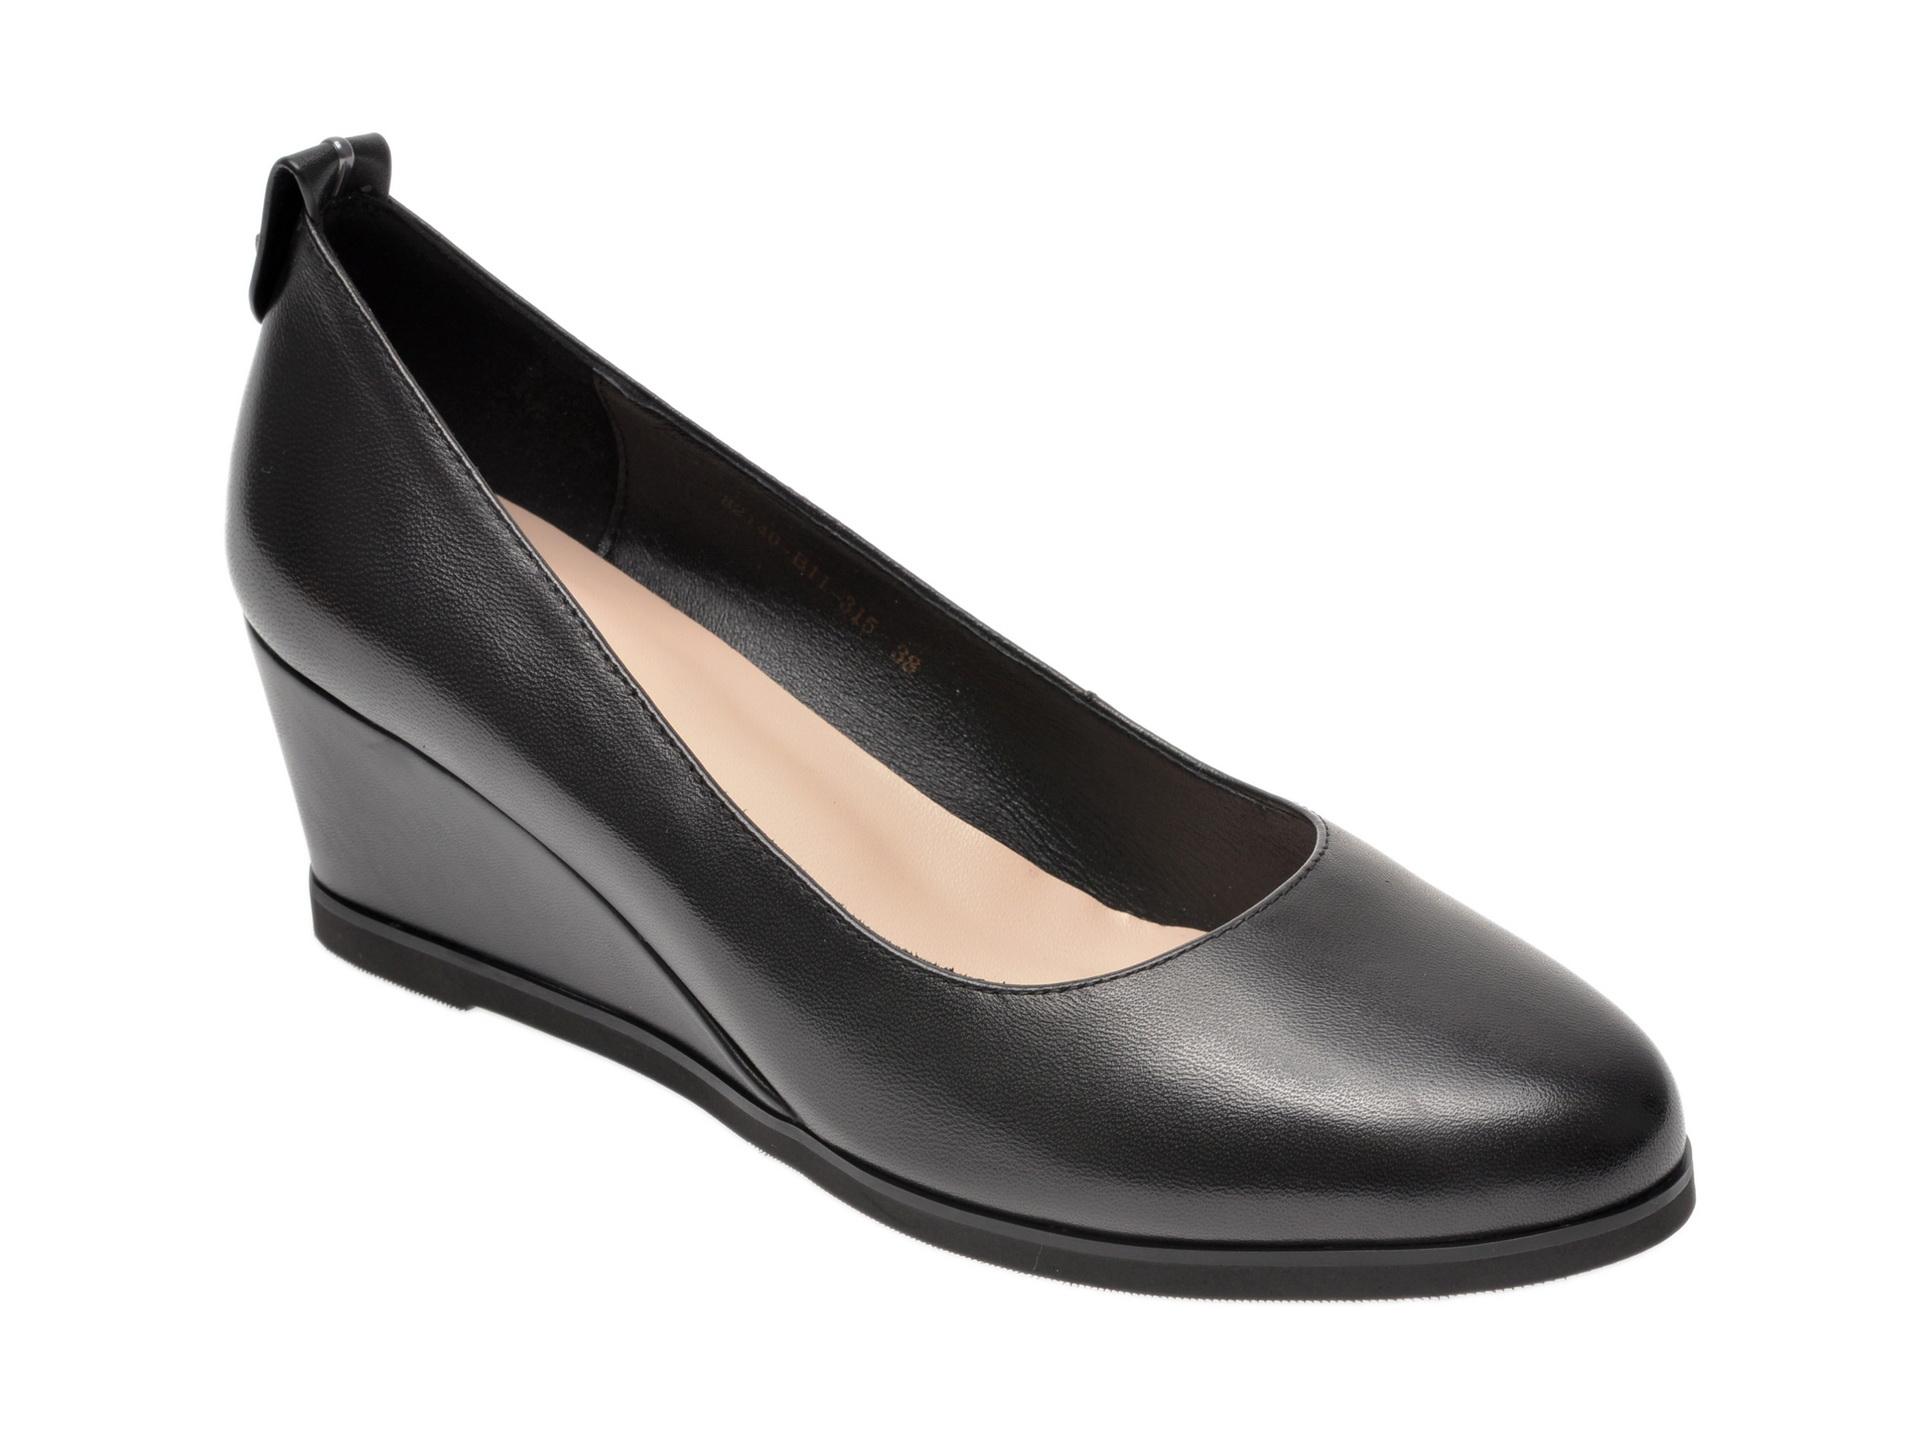 Pantofi IMAGE negri, 82140B1, din piele naturala